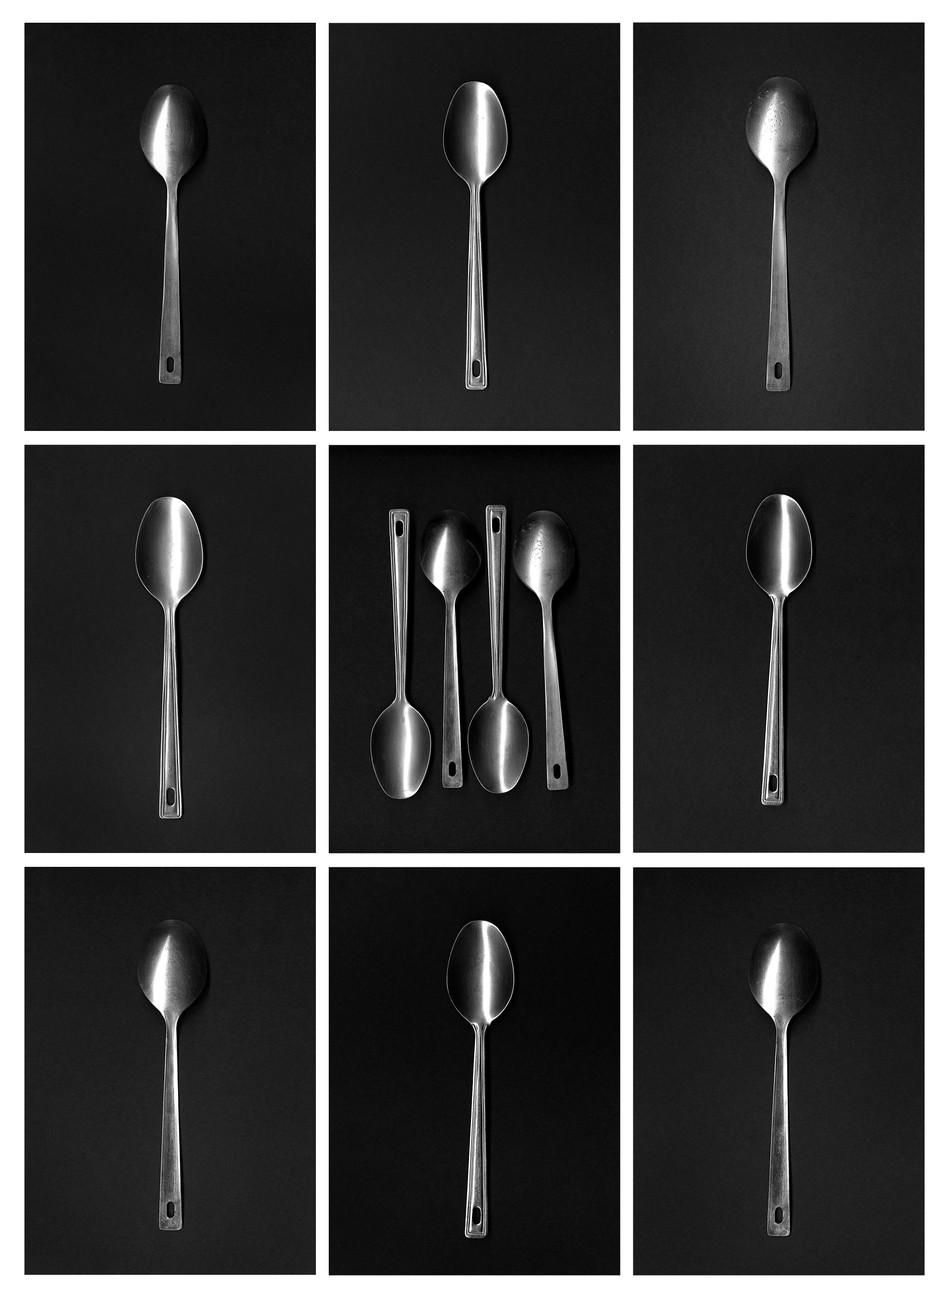 olateperspoons.jpg